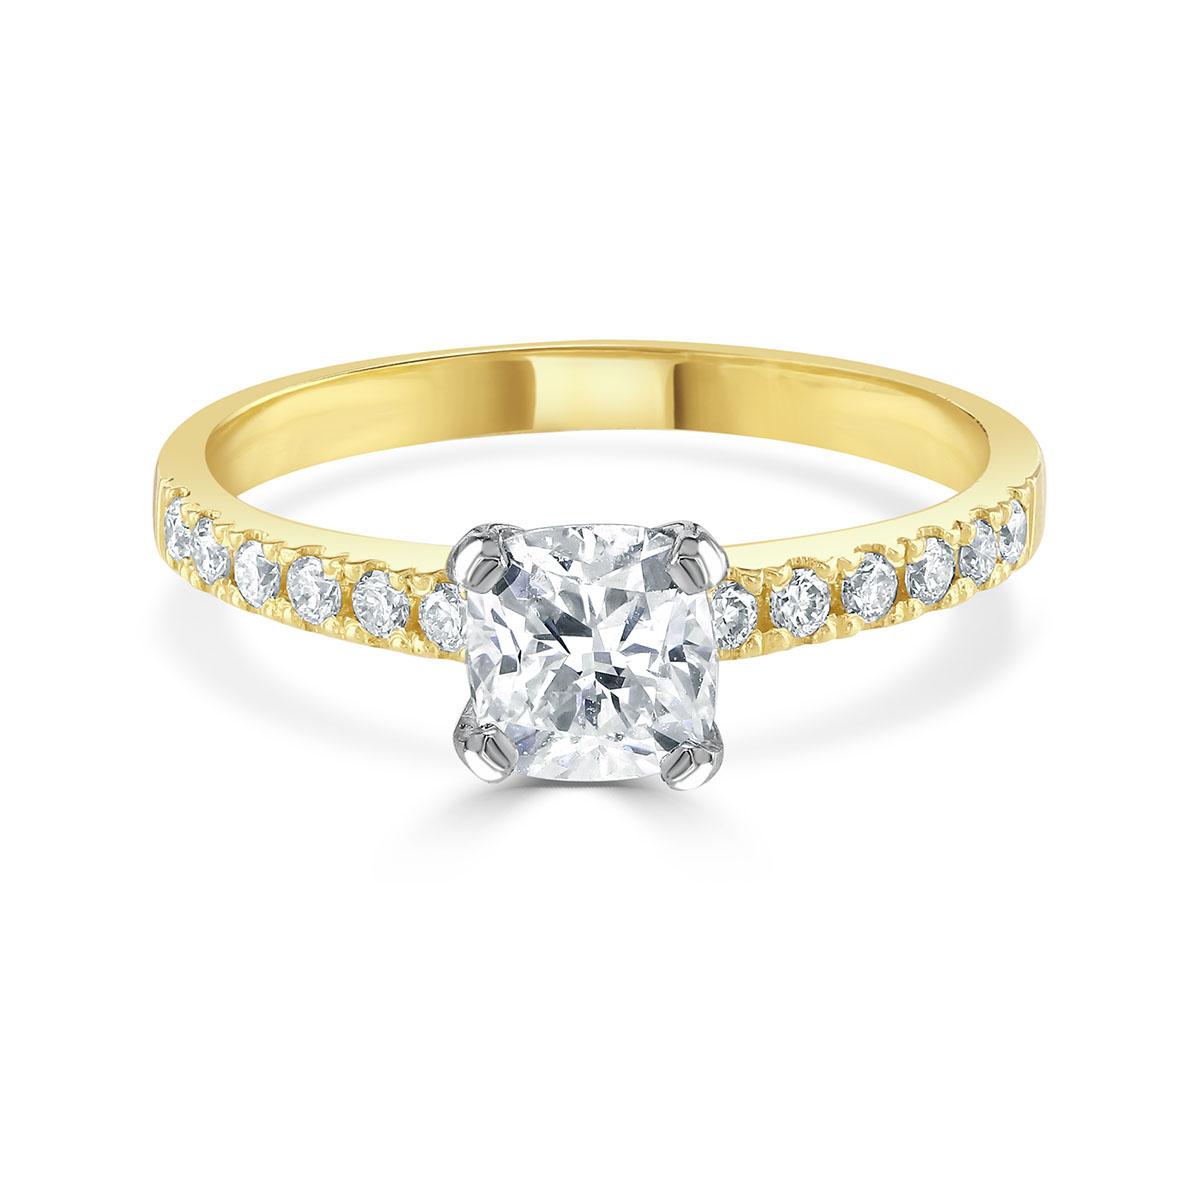 Cushion Cut Yellow Gold Diamond Ring